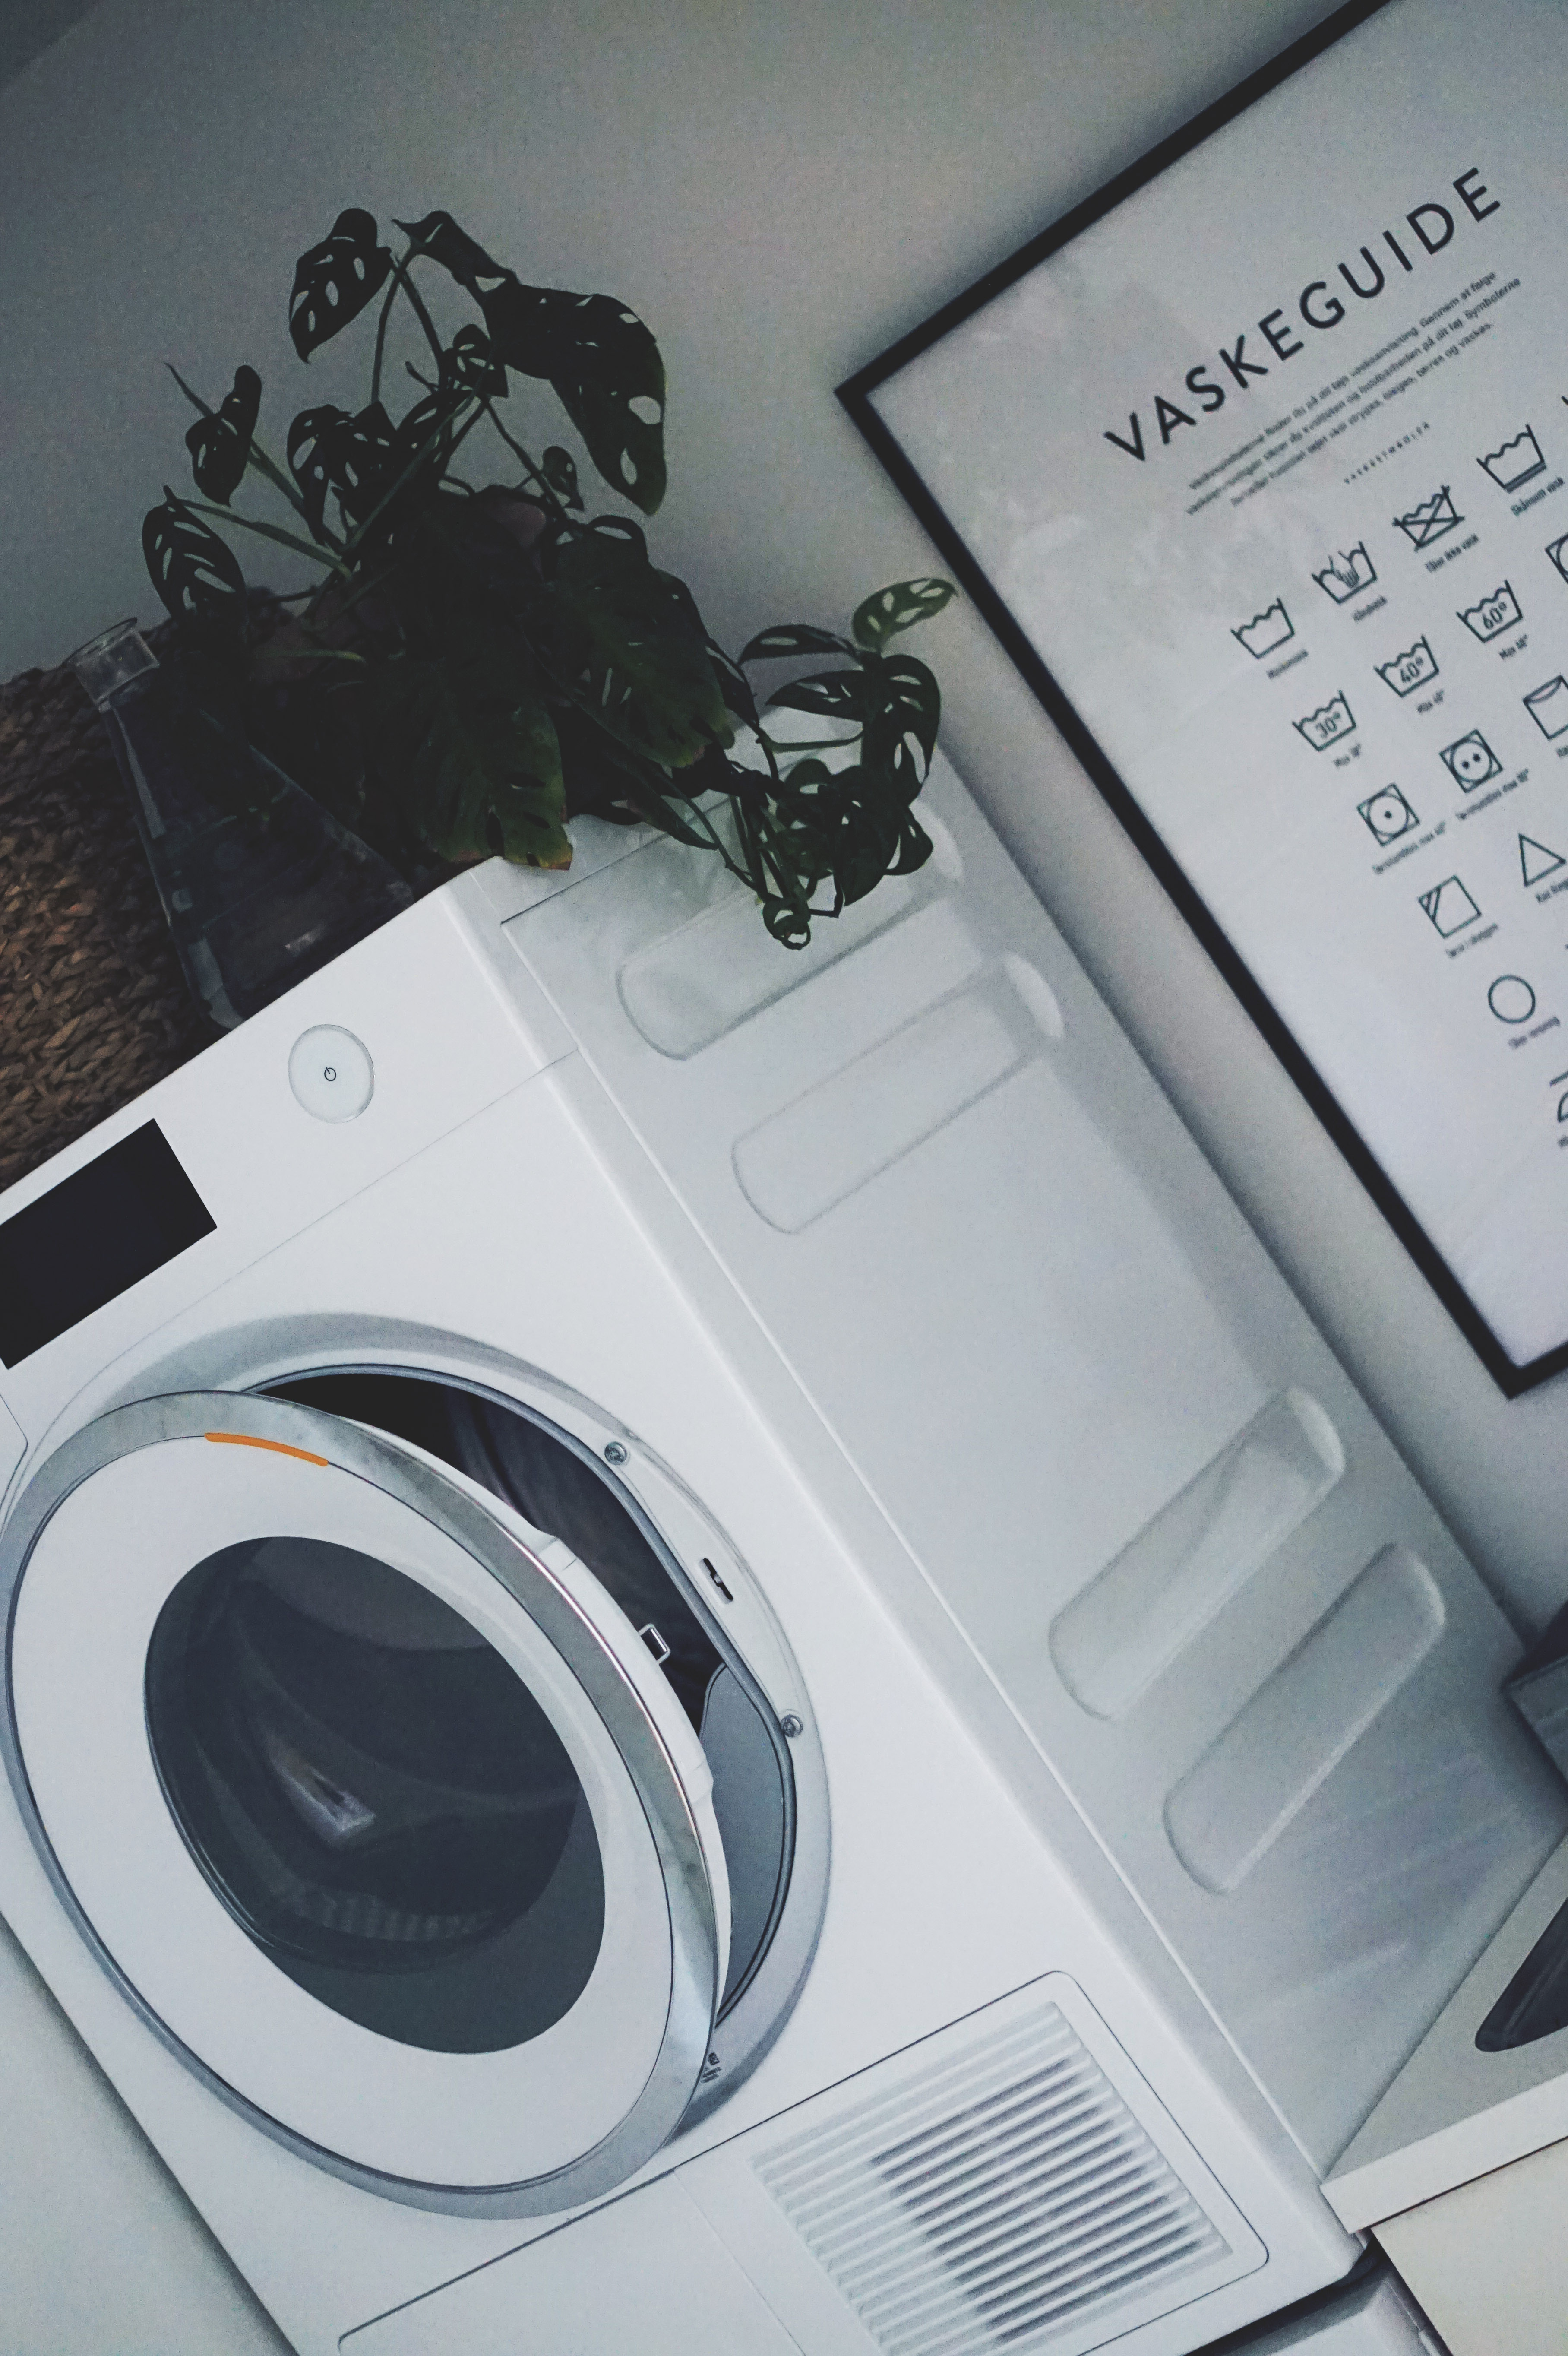 Huskøb: Livet med bryggers og <strong>Mieles</strong> vaskemaskine og tørretumbler 1